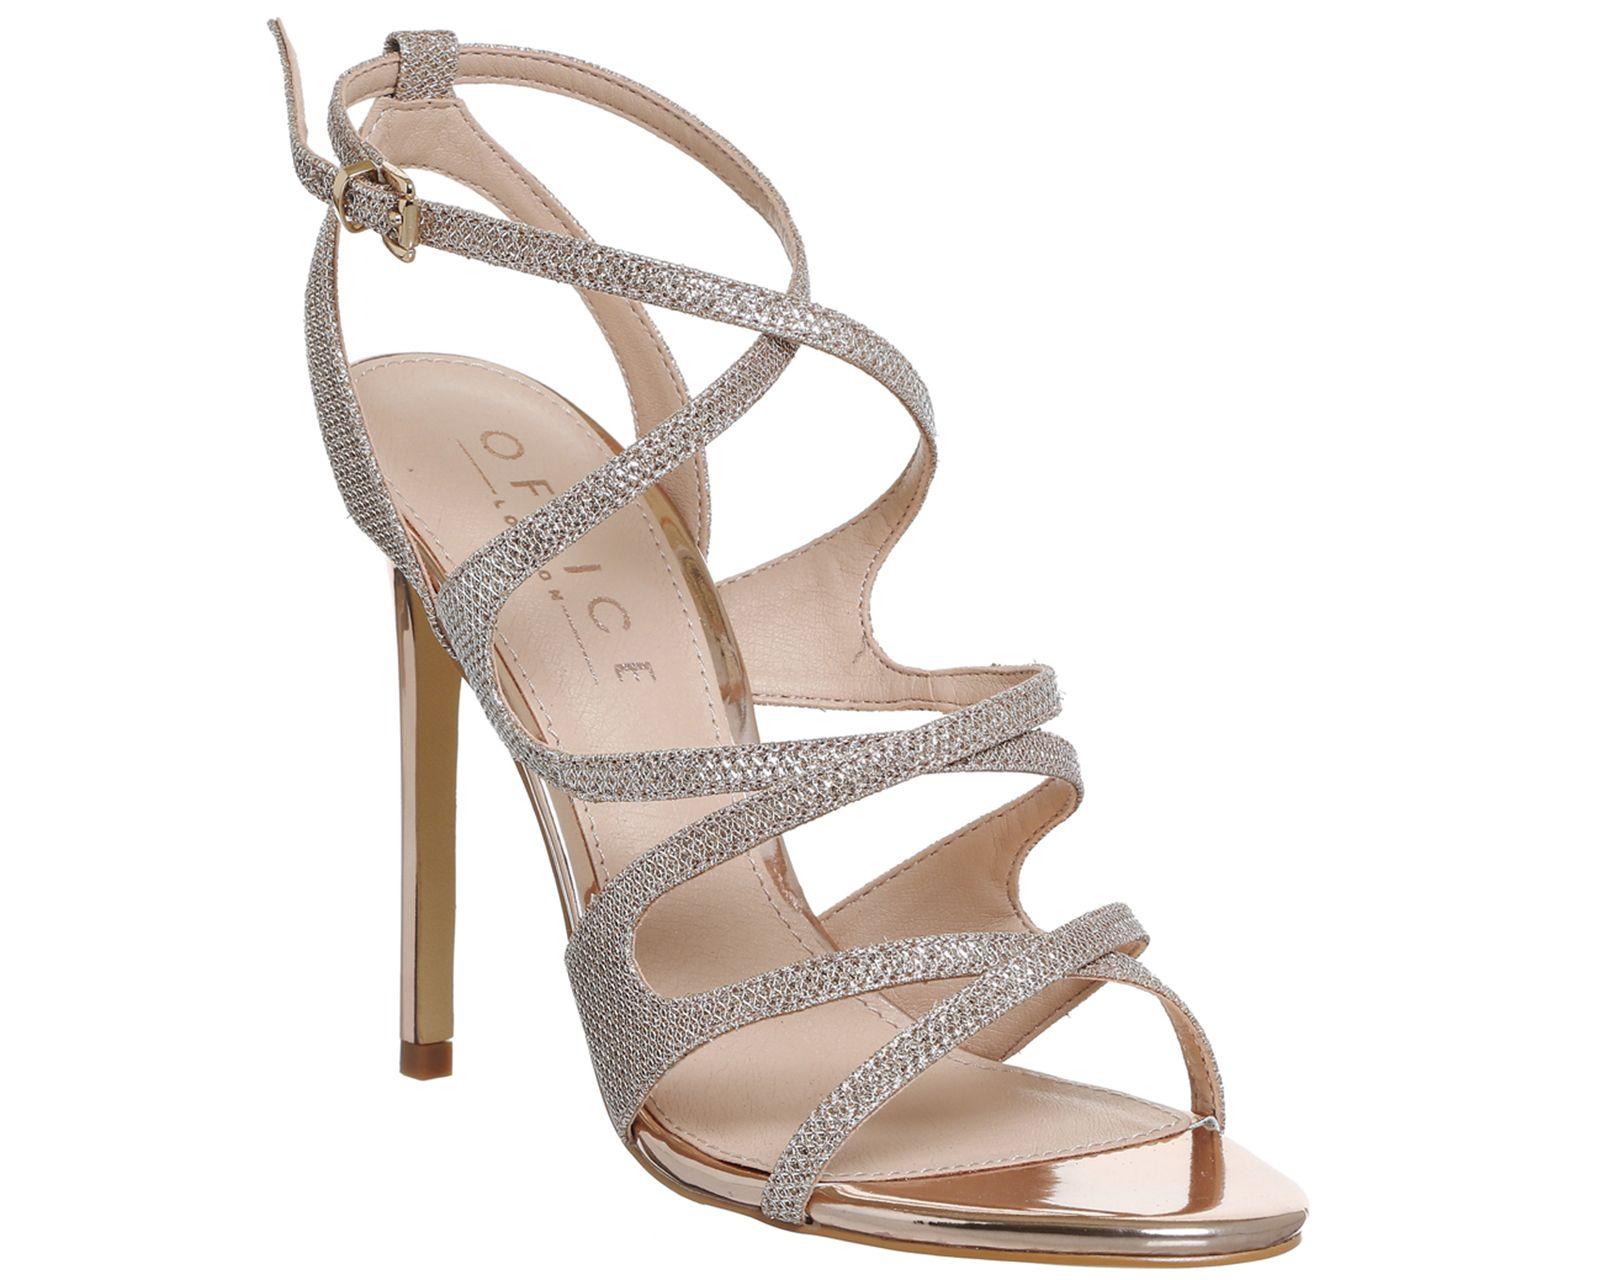 86c562cf7488 Office Hotness Strappy Heels Rose Gold Lurex